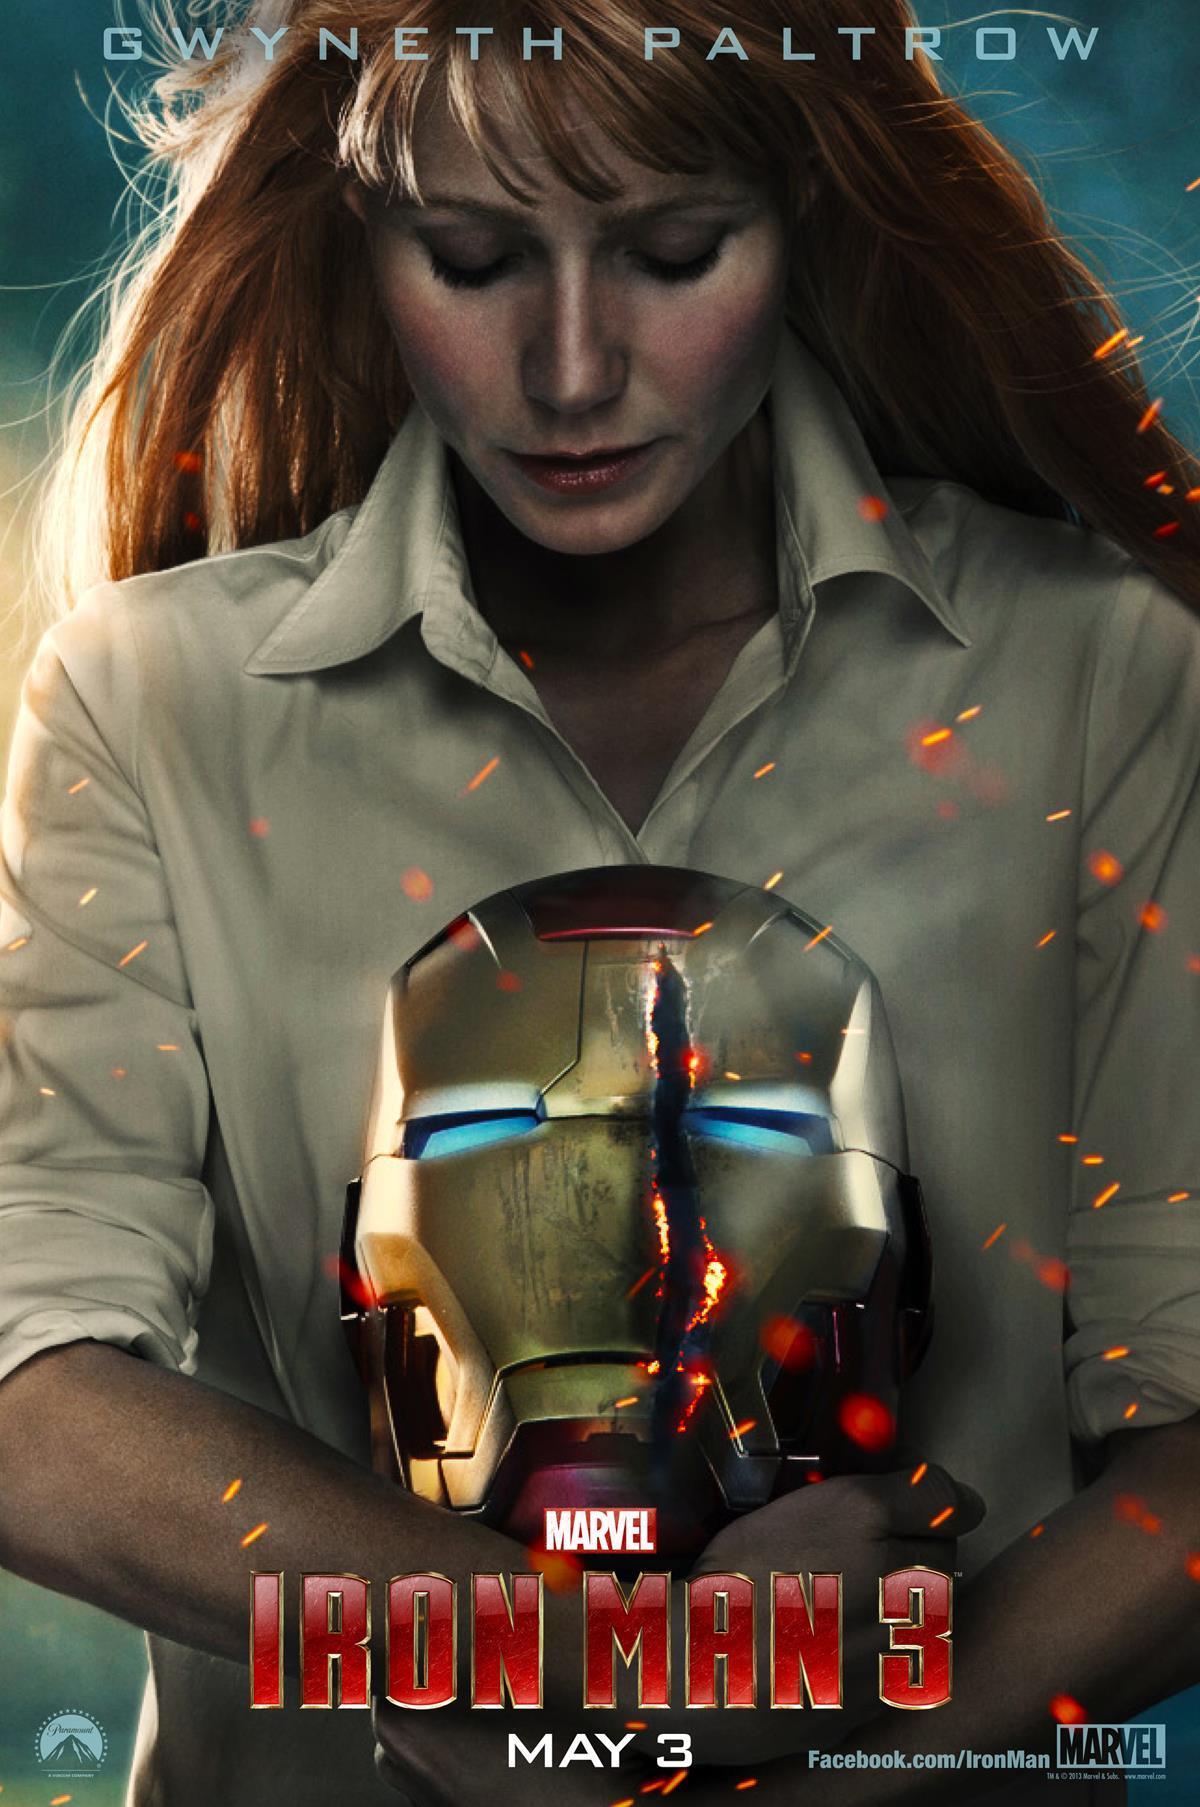 《钢铁侠3》新海报; 钢铁侠3;;; 钢铁侠